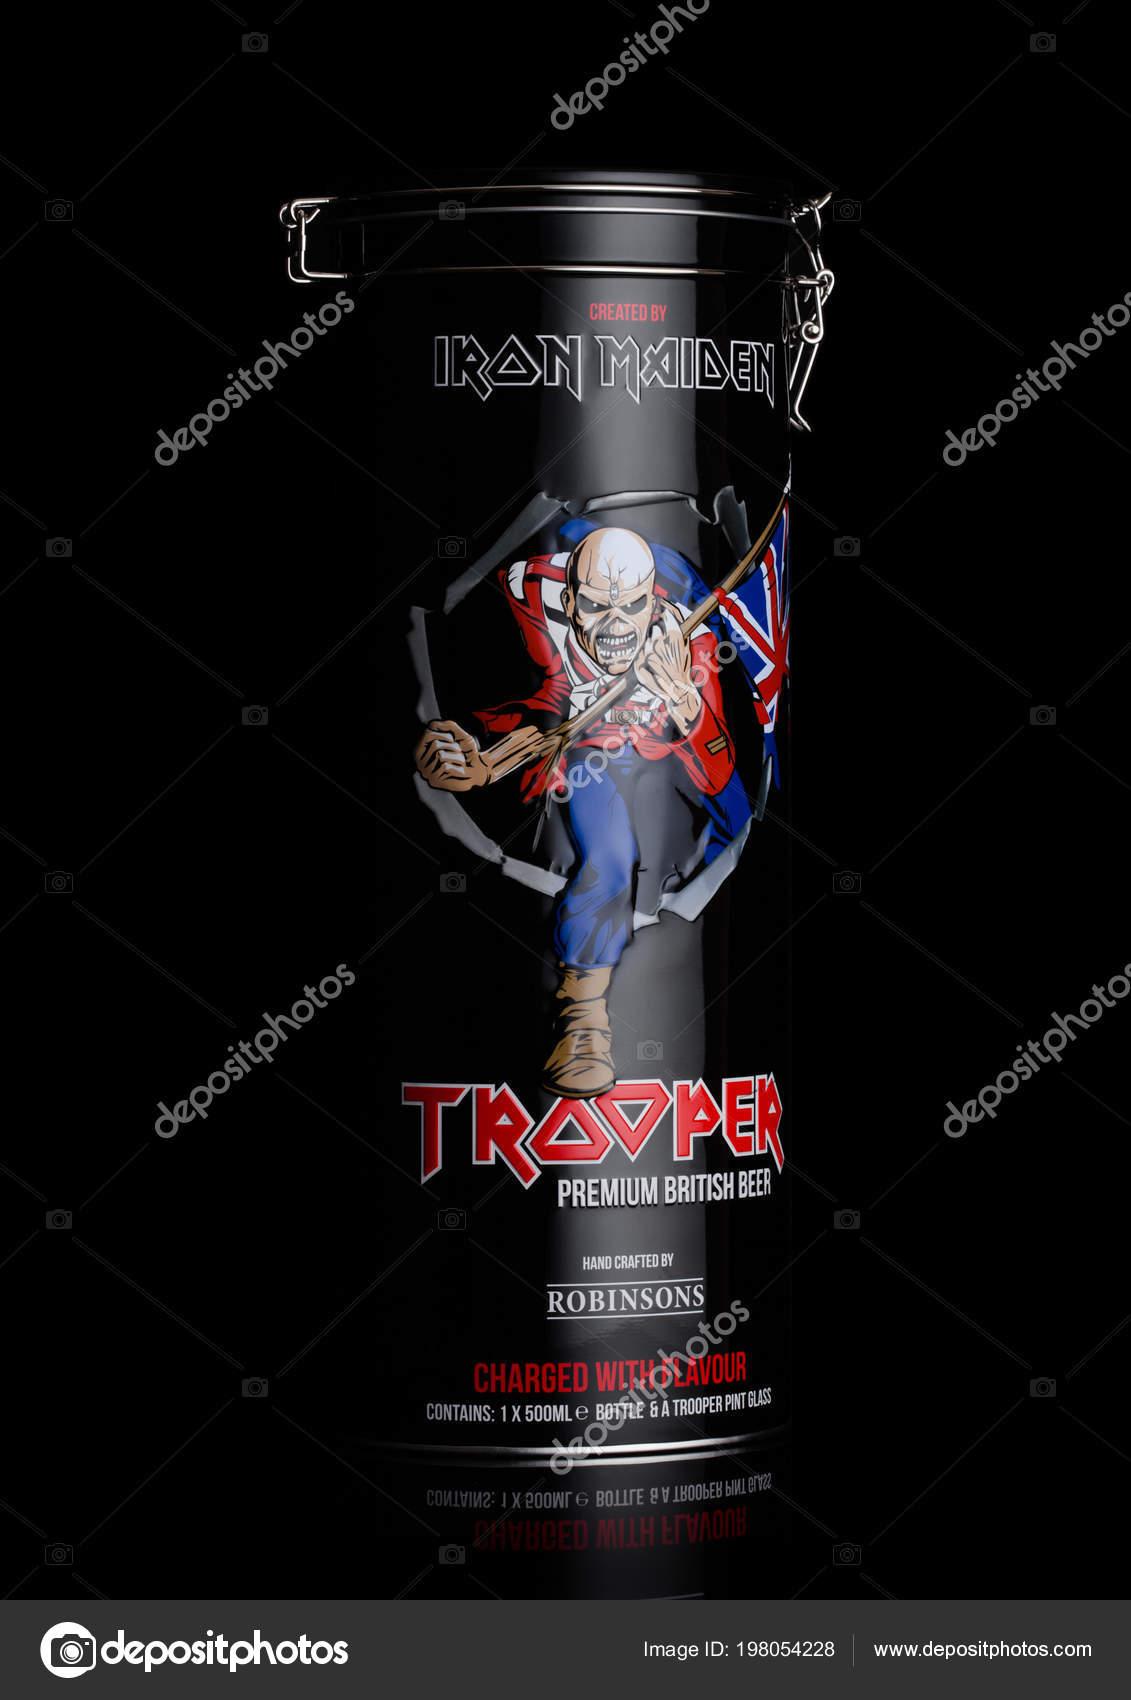 London June 2018 Gift Steel Tube Trooper Premium British Beer Stock Photo